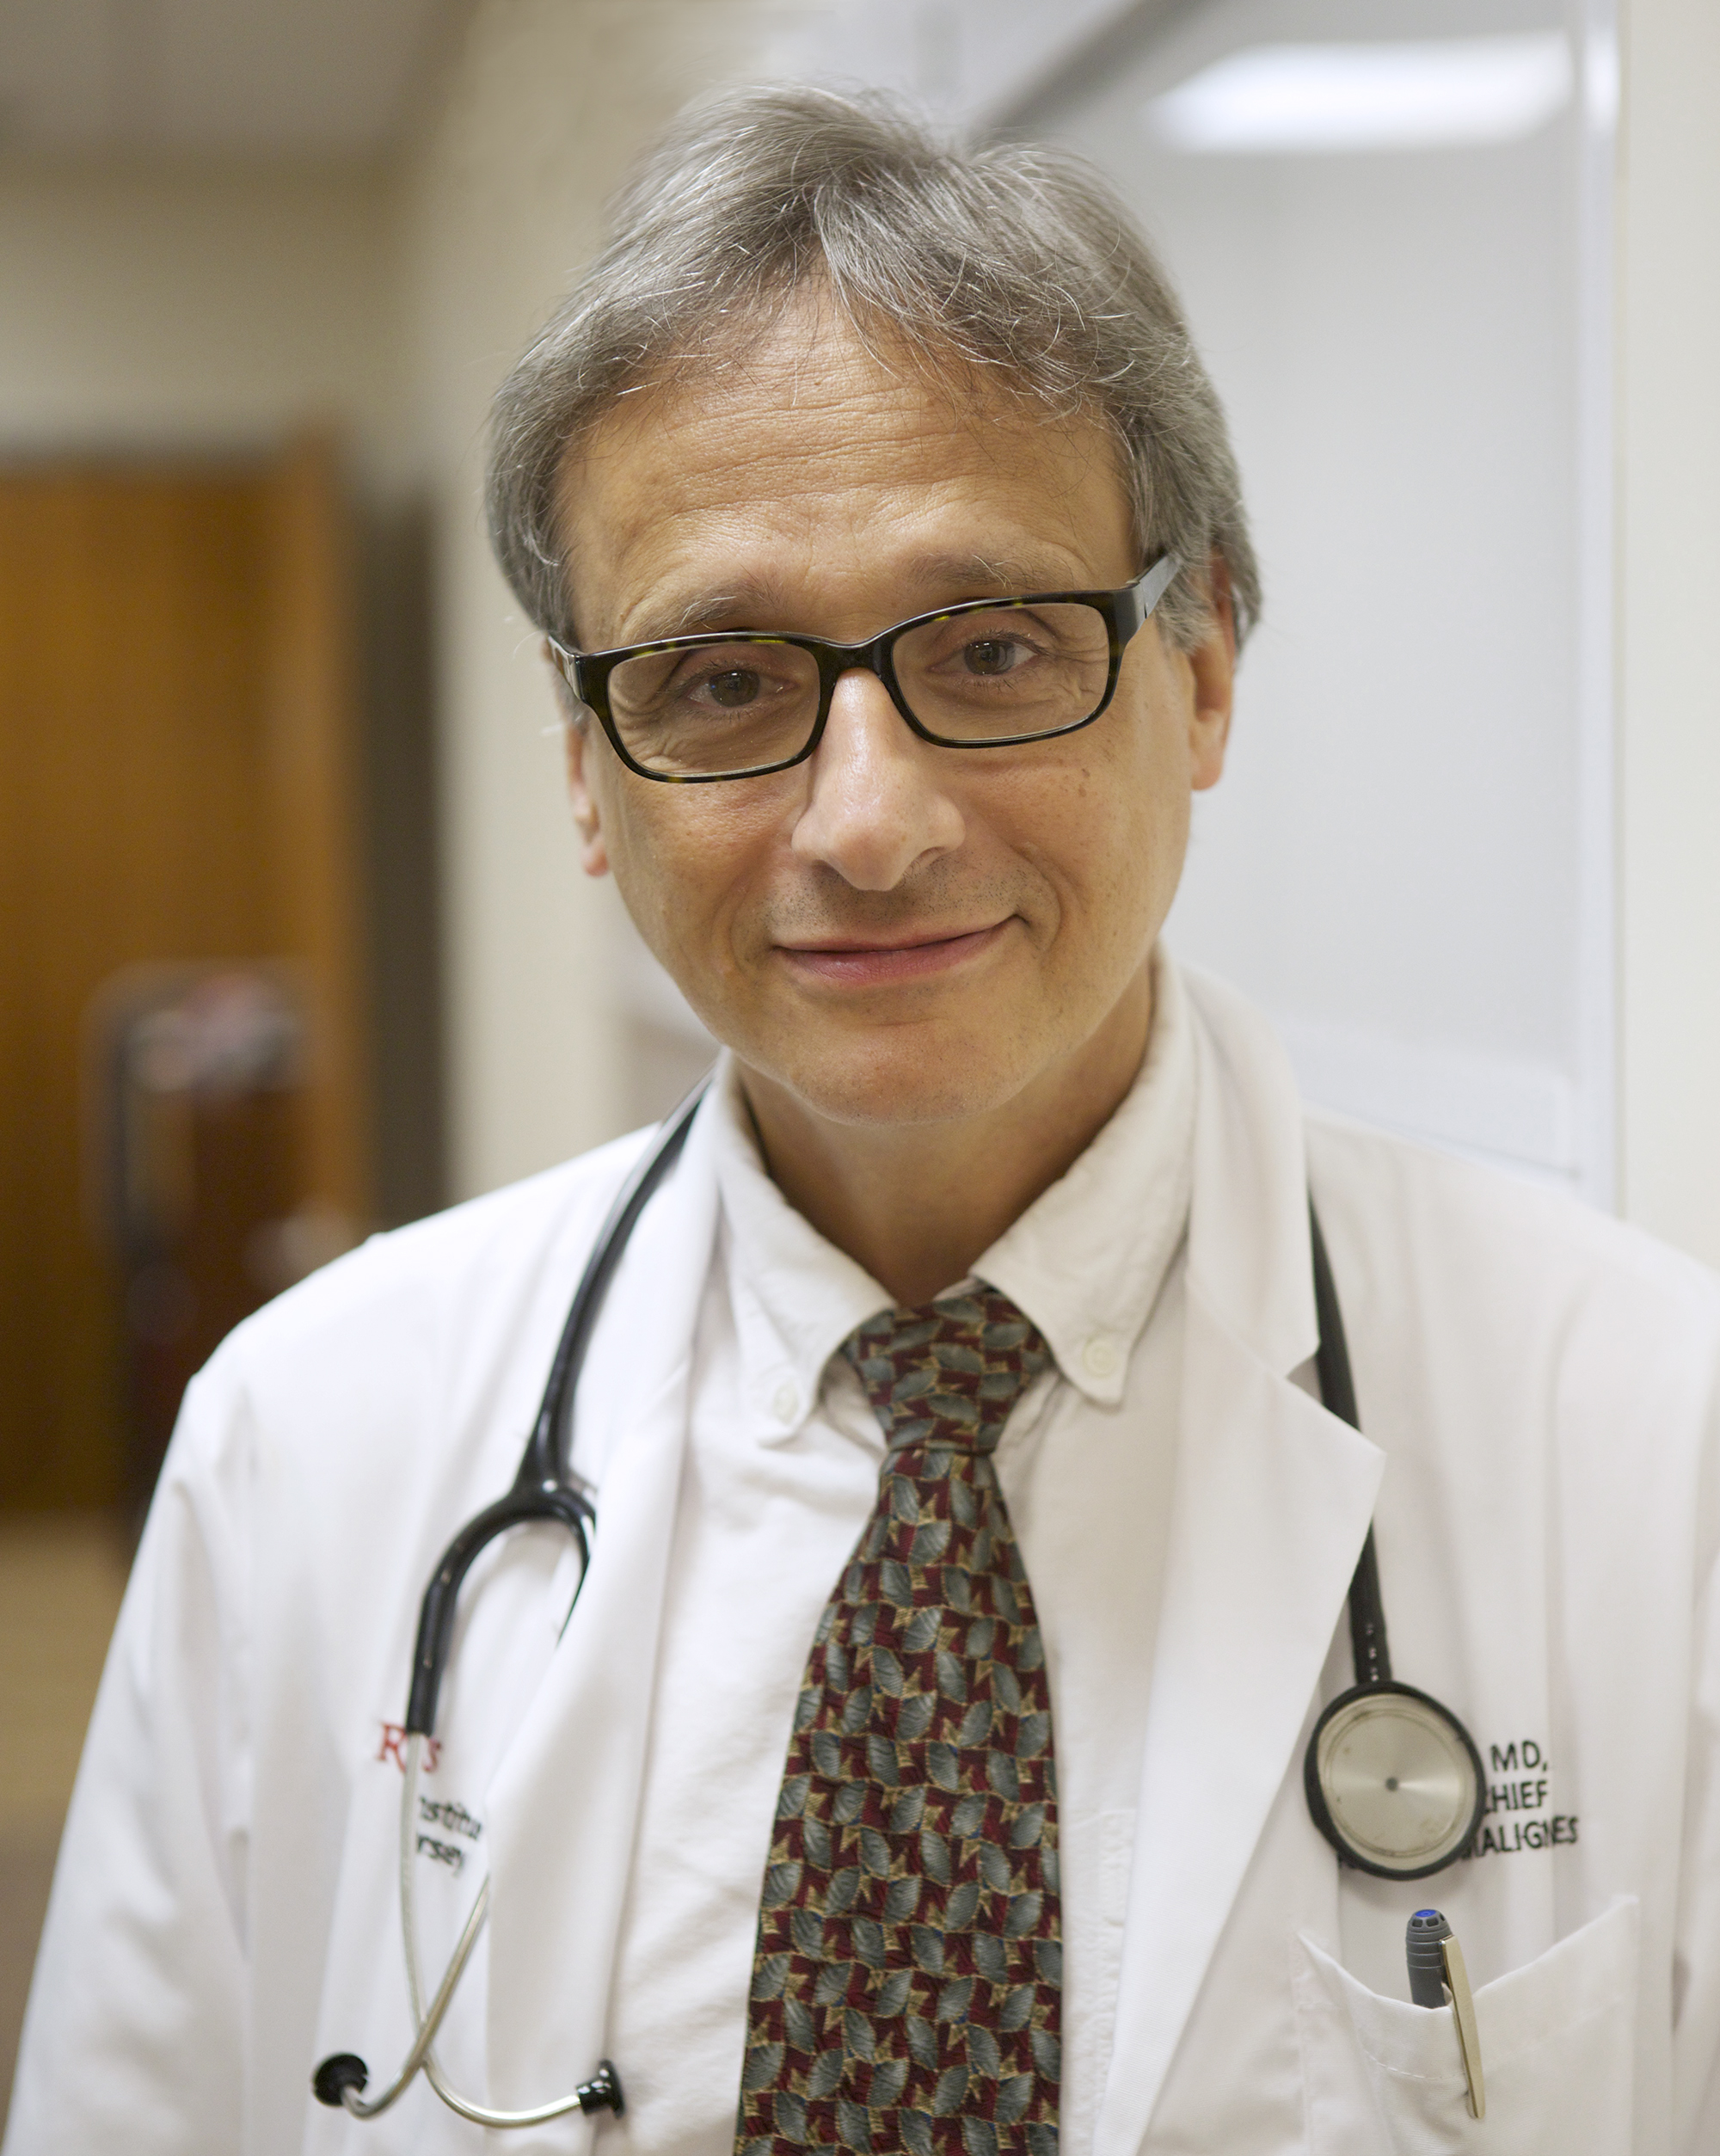 Roger Kurt Strair, MD, PhD -